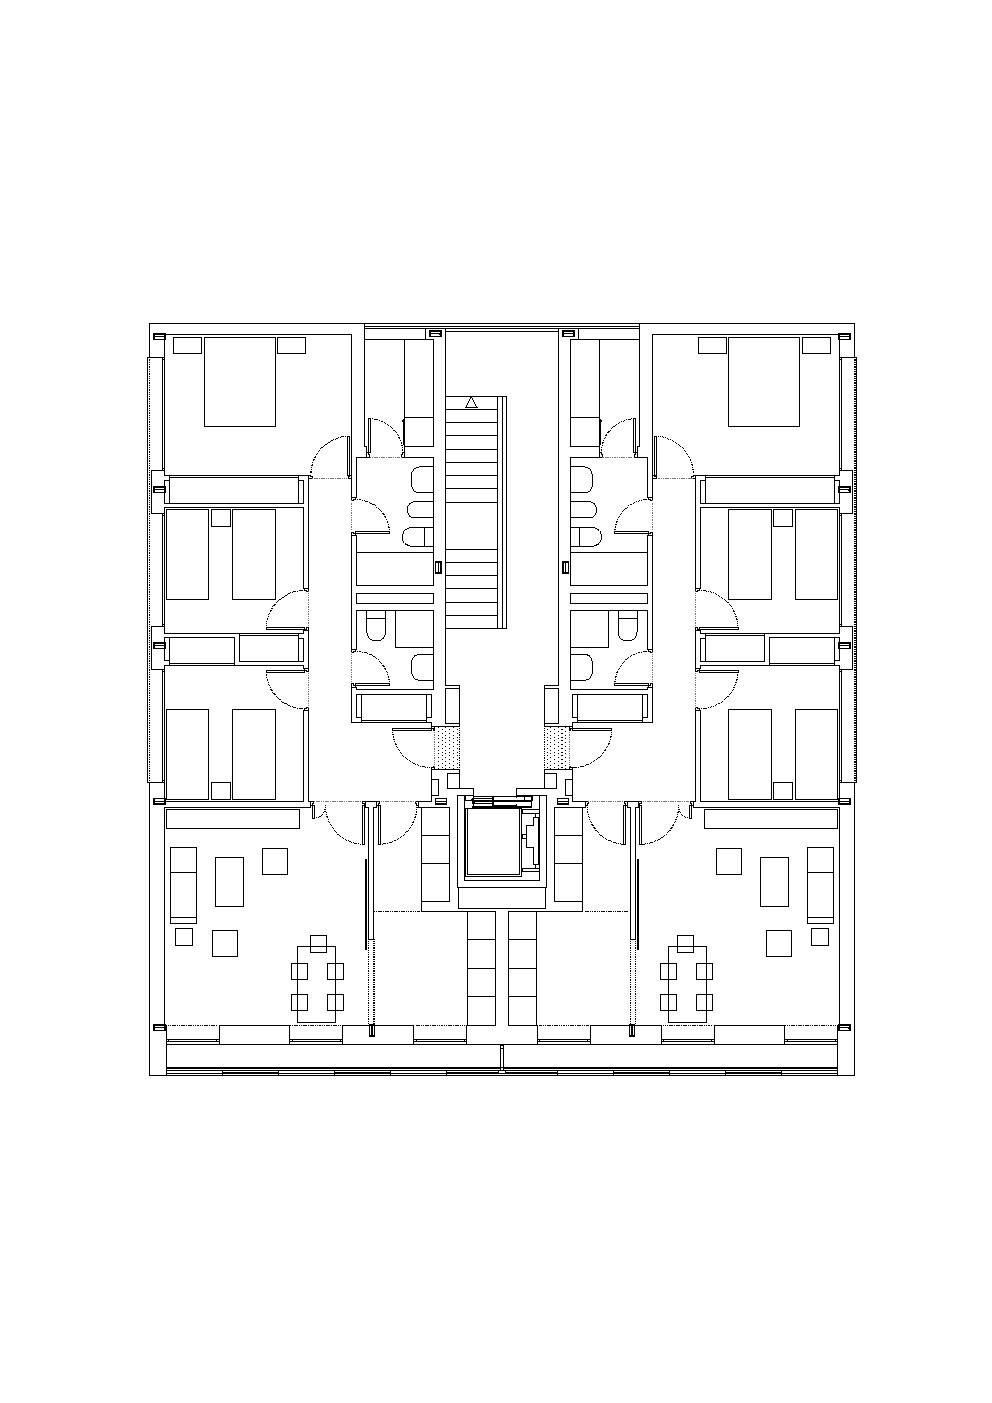 Gallery Of Social Housing Burgos Garrido Arquitectos 13 Social Housing Floor Plan Drawing How To Plan